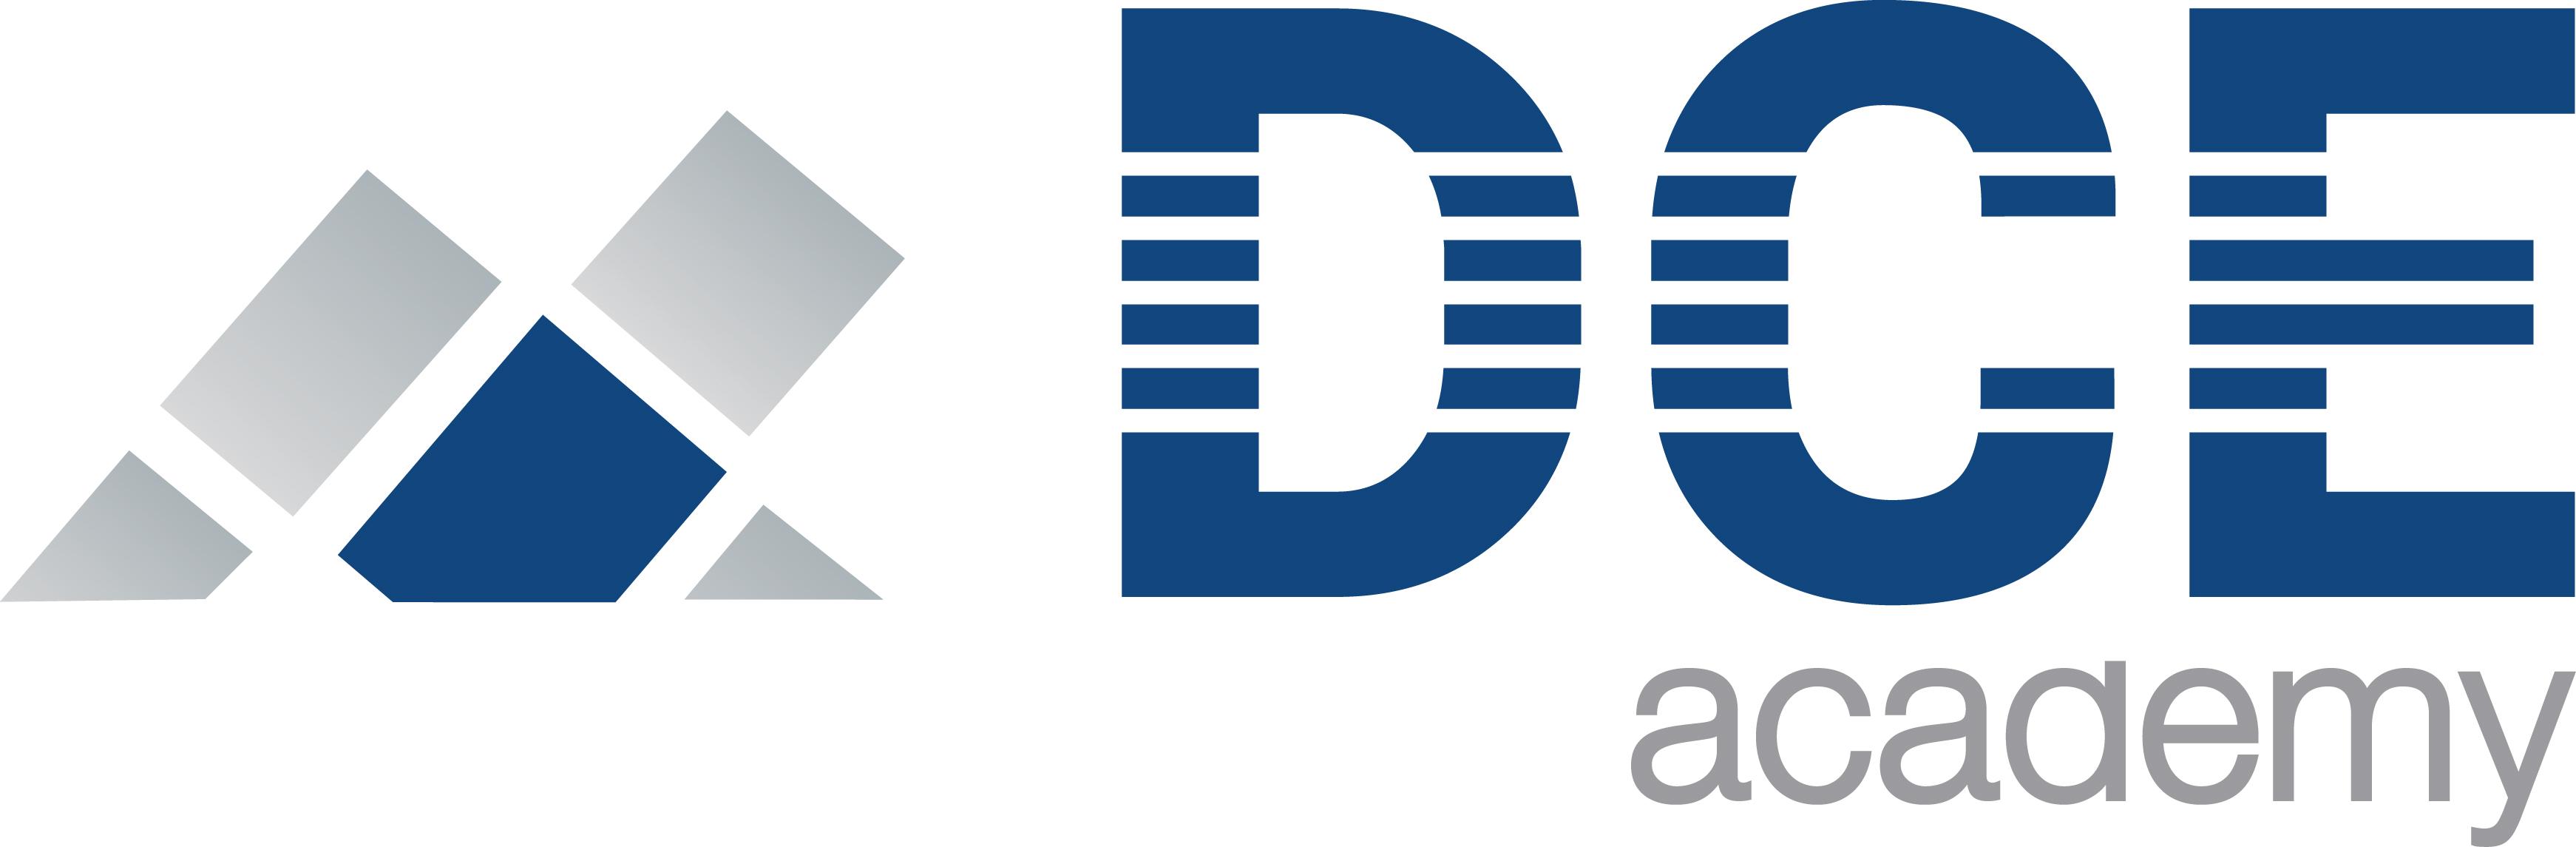 DCE academy GmbH